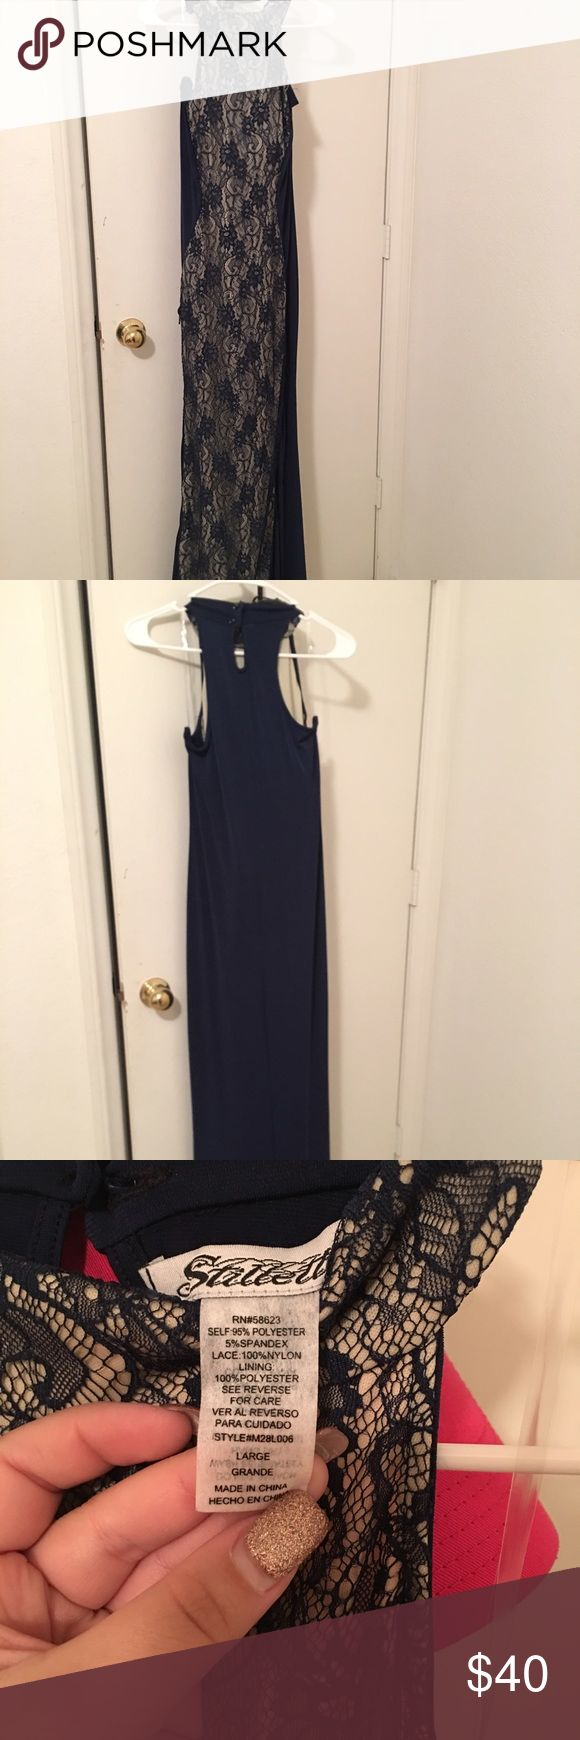 Formal dress Navy blue and cream formal dress. Stretchy spandex material never worn EUC Stilletto Dresses